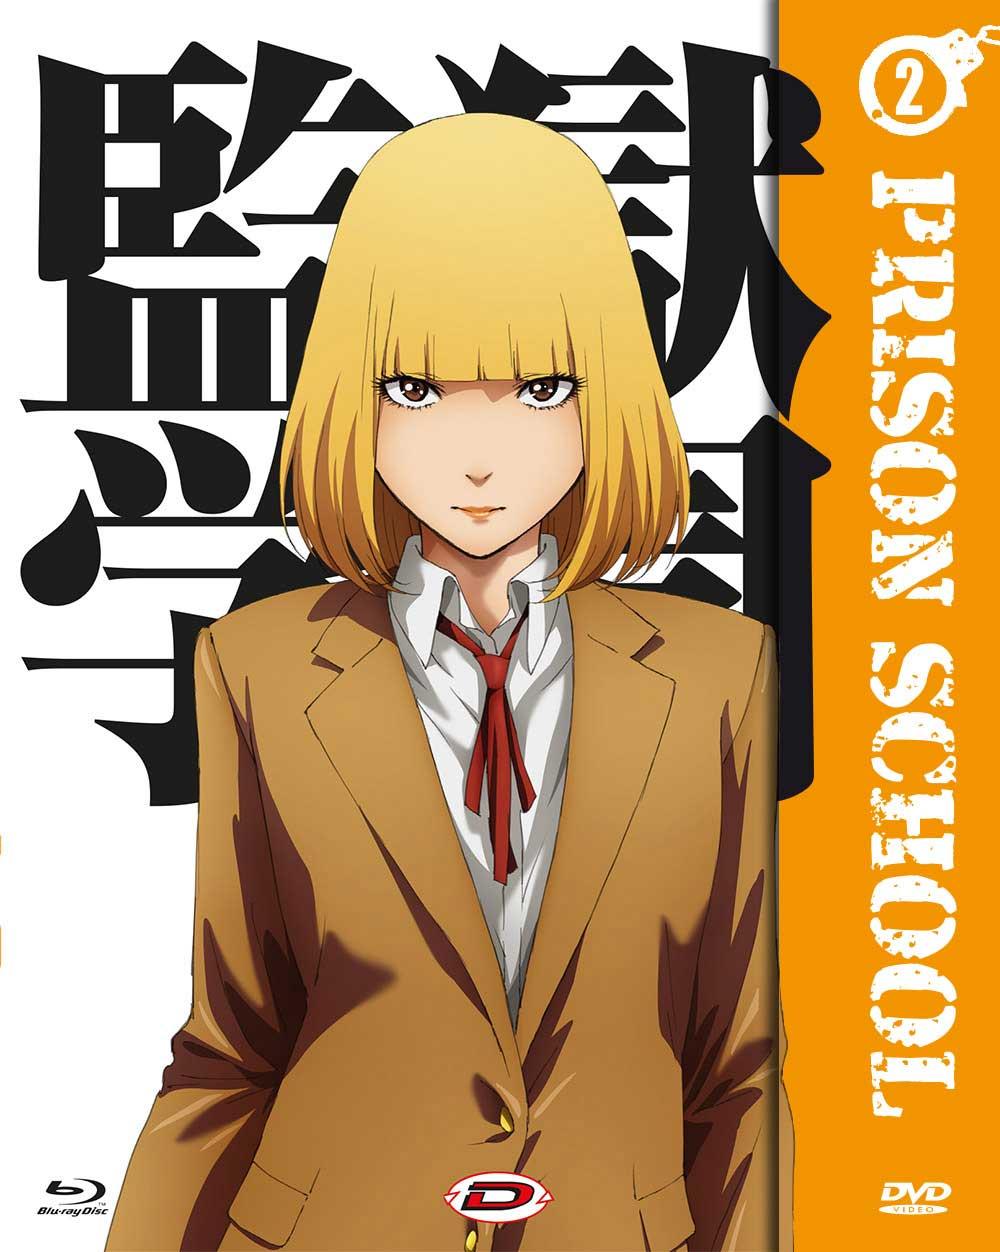 PRISON SCHOOL #02 (EPS 05-08) (LTD) (BLU-RAY+DVD)